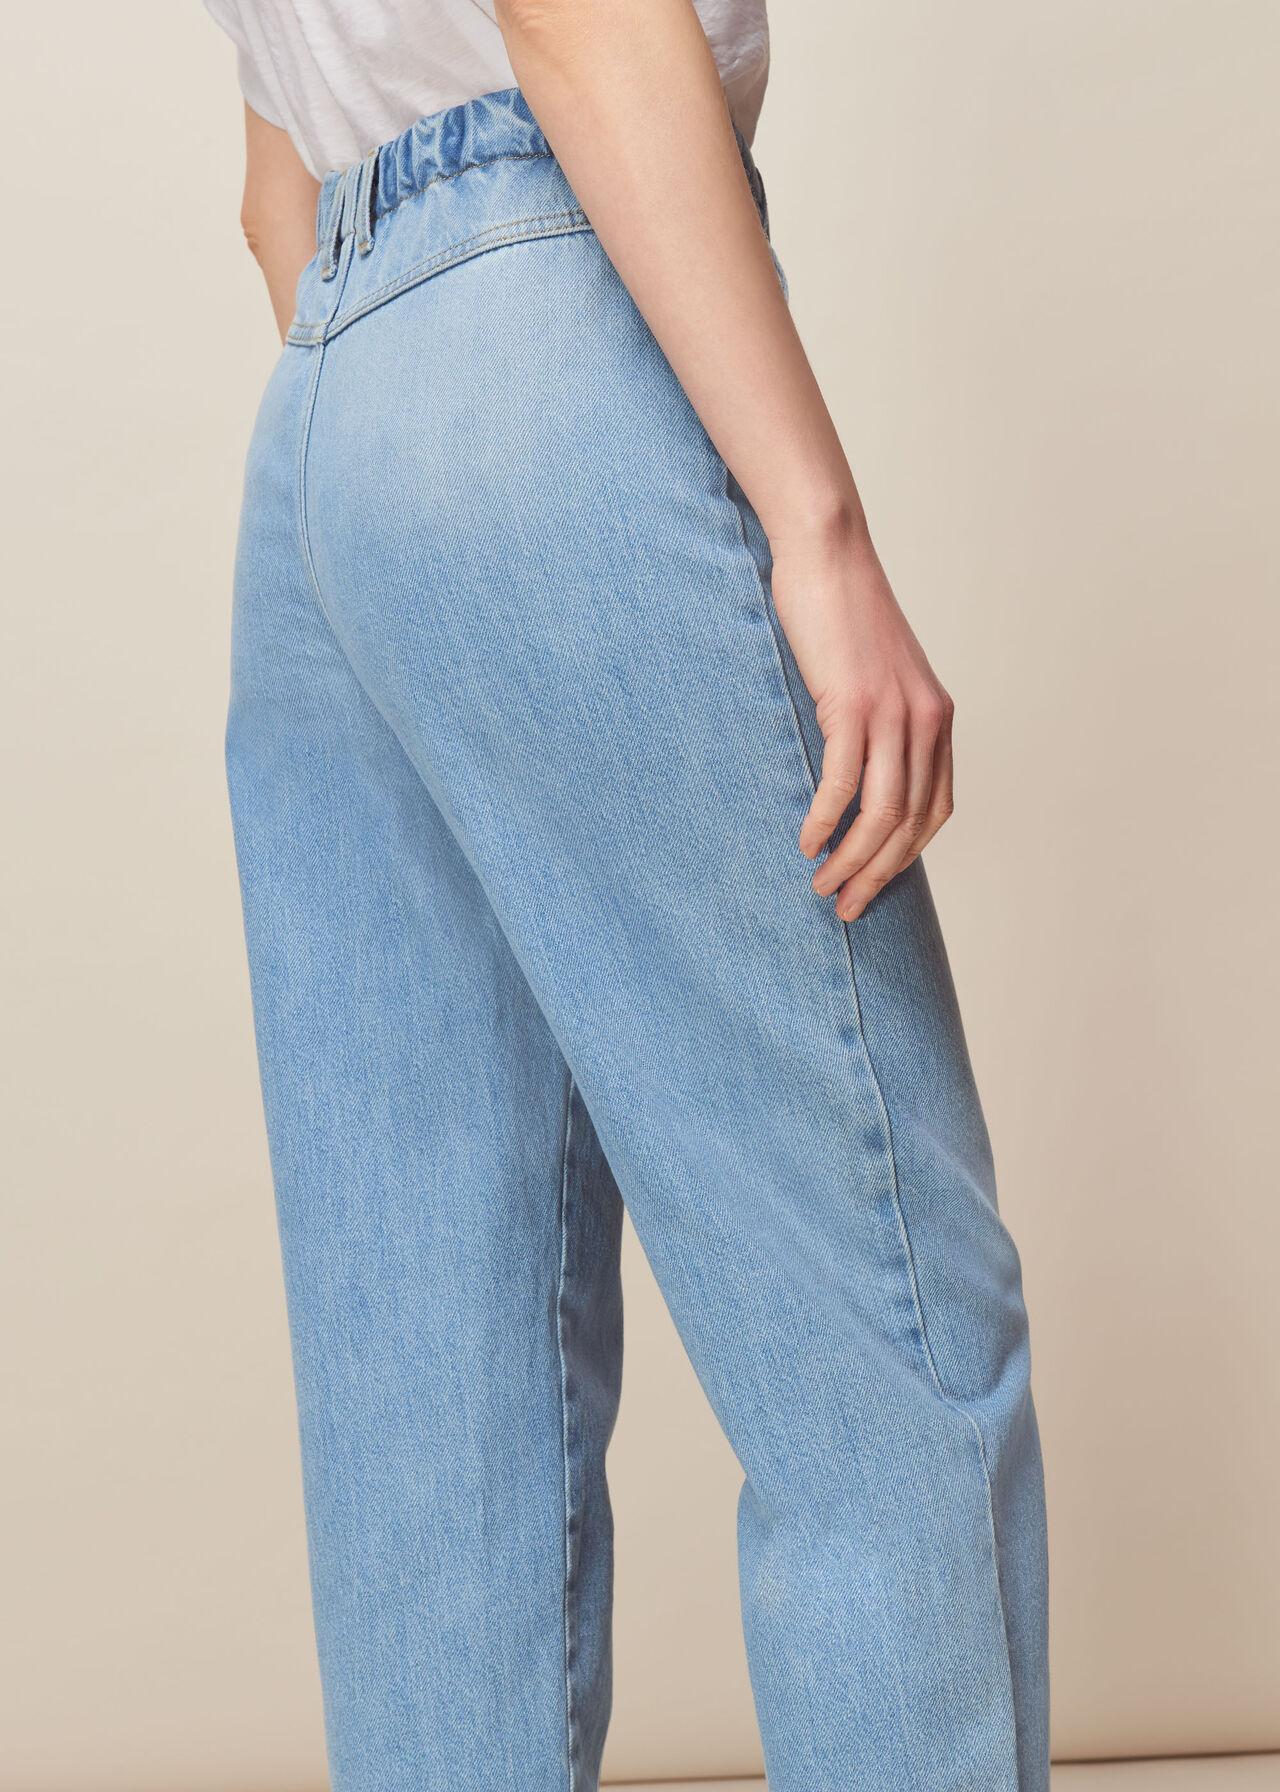 Elasticated Waist Soft Jean